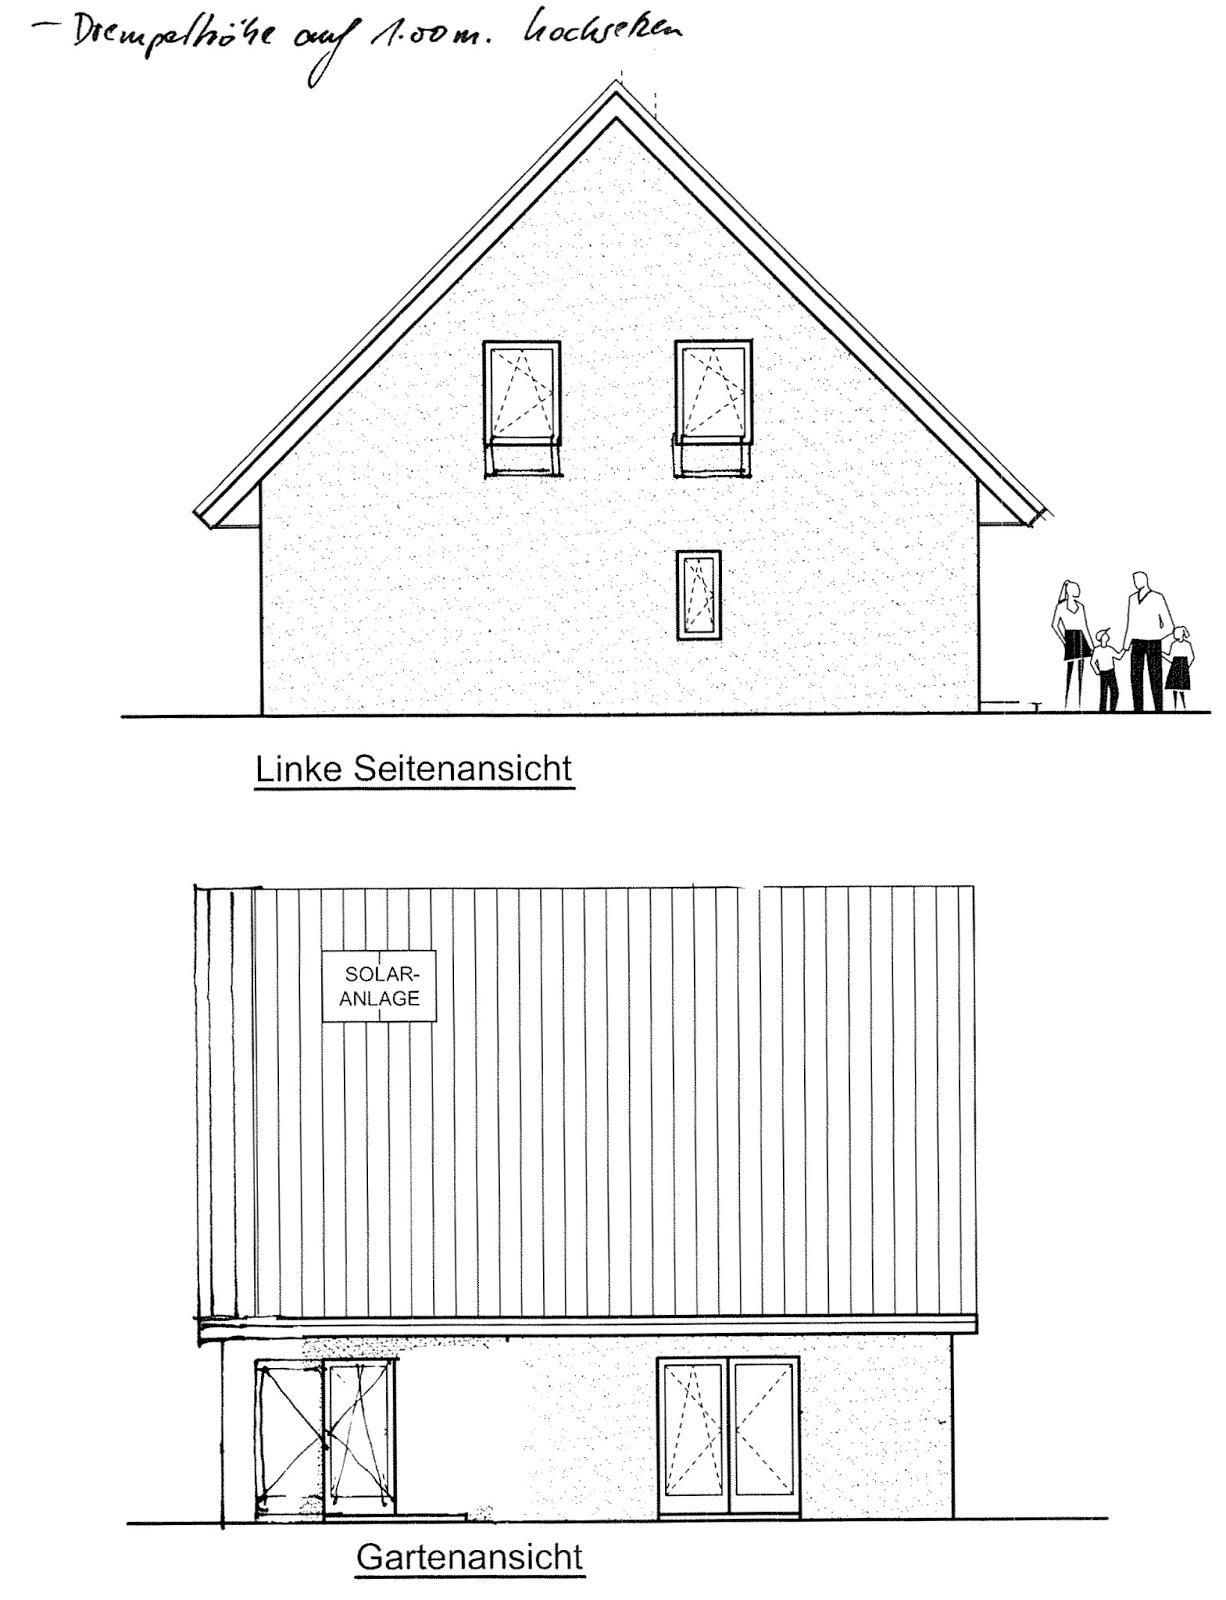 Bautagebuch hassenroth ortstermin grundst ck hausplanung for Hausplanung grundriss